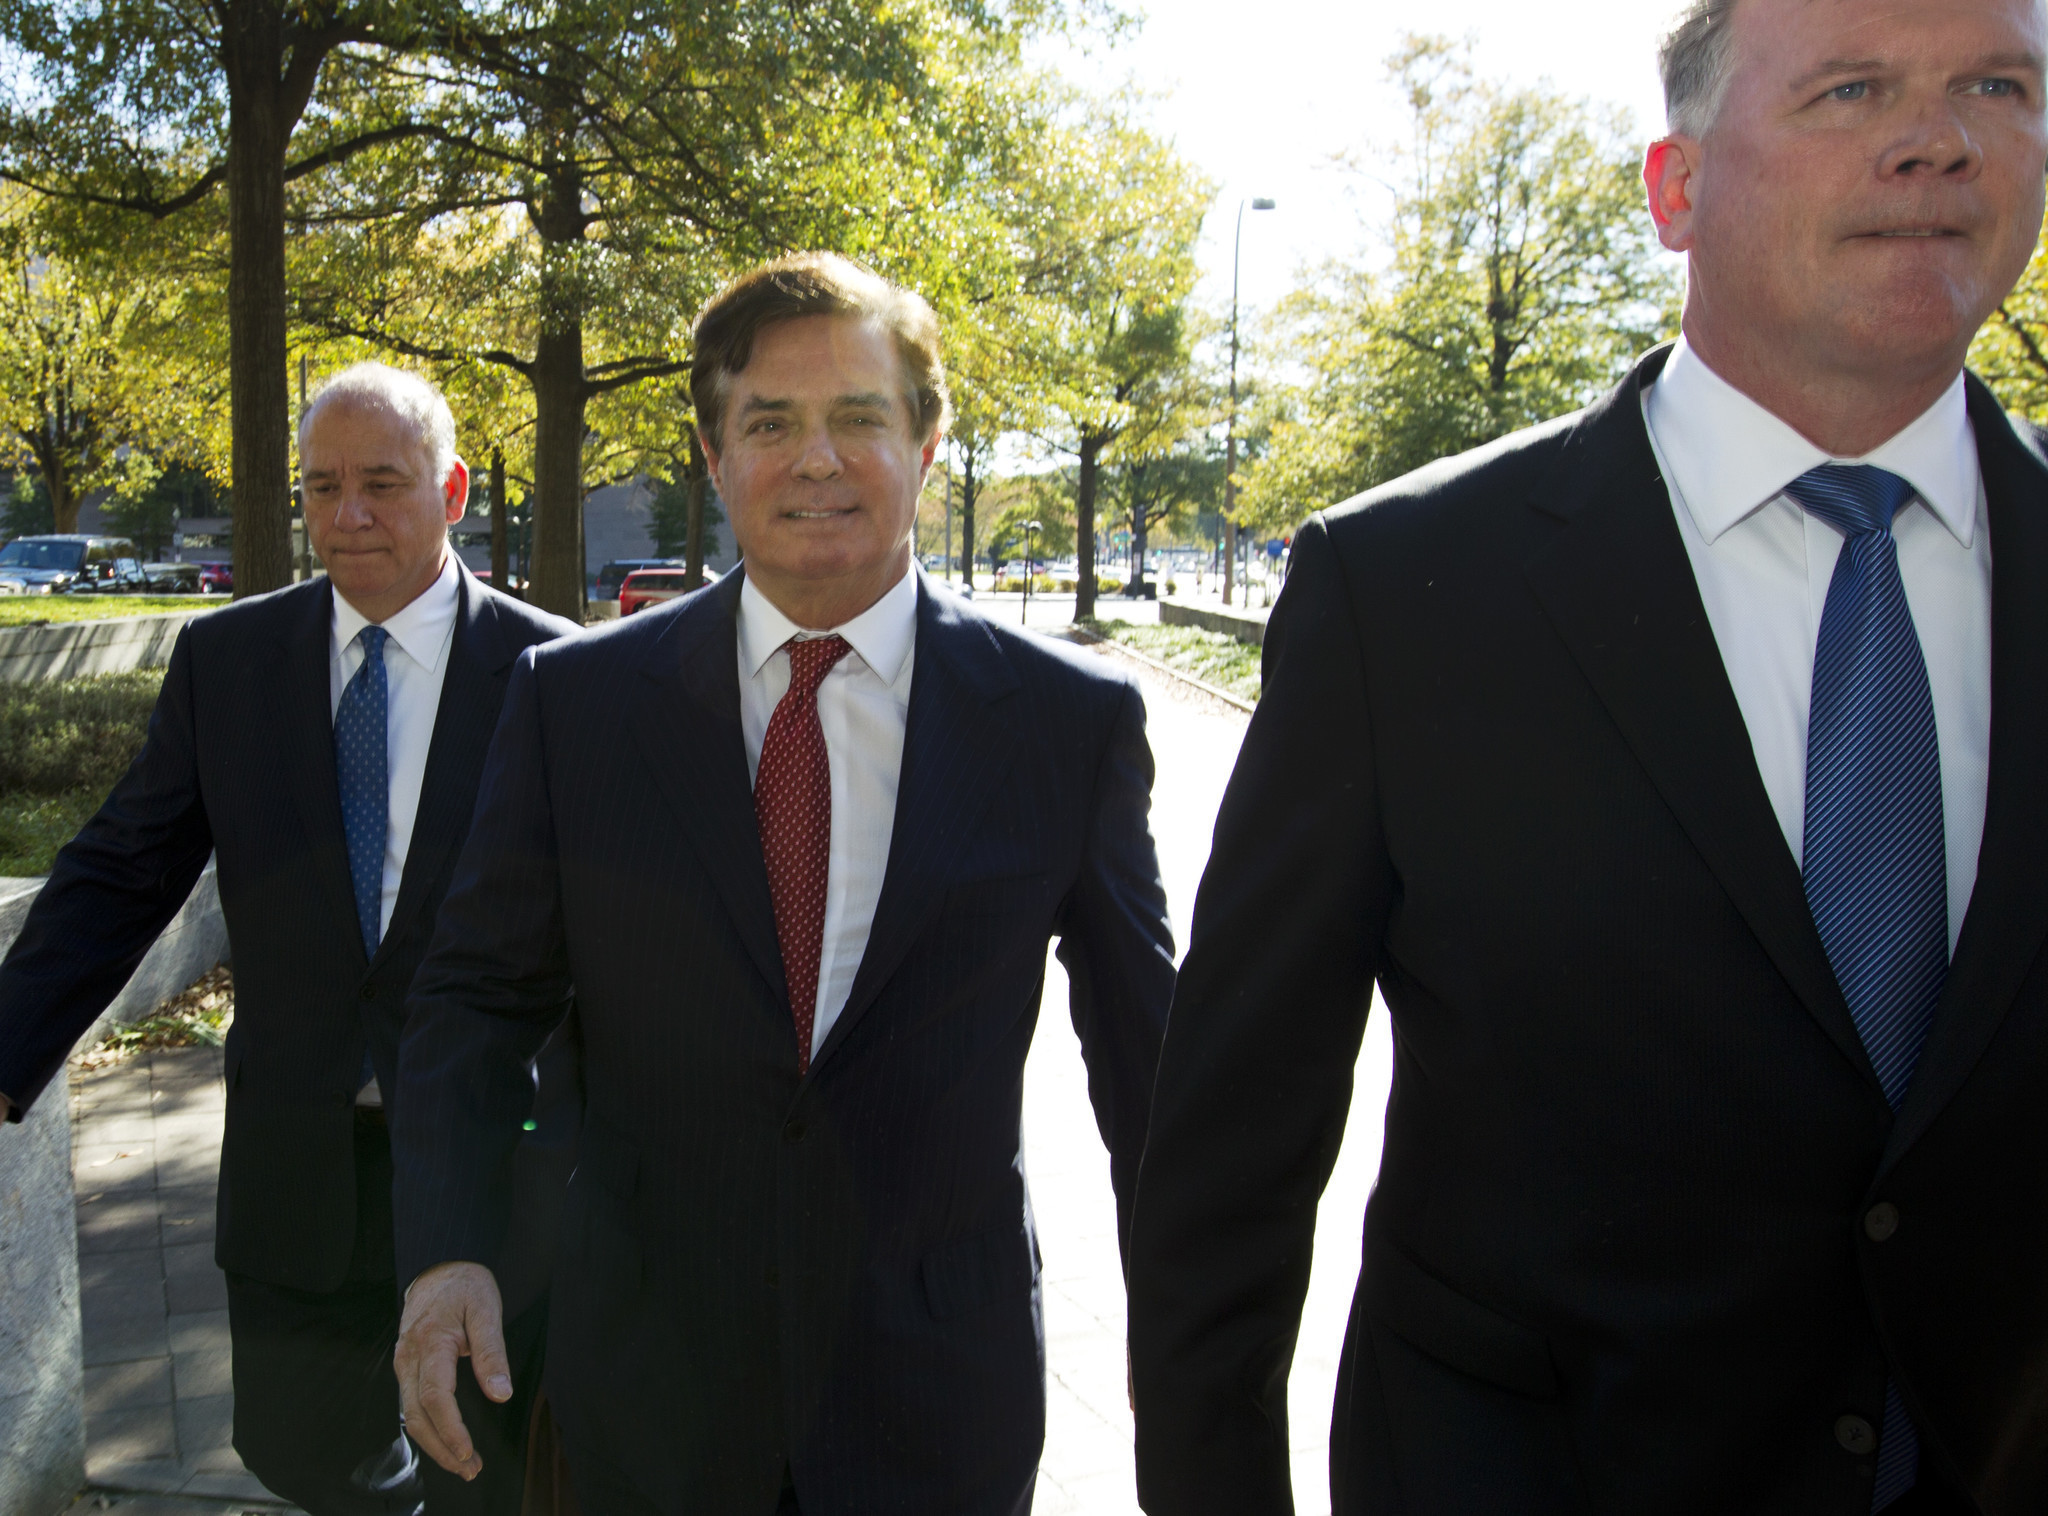 Manafort's co-defendant's attorneys leaving defense team in Mueller probe